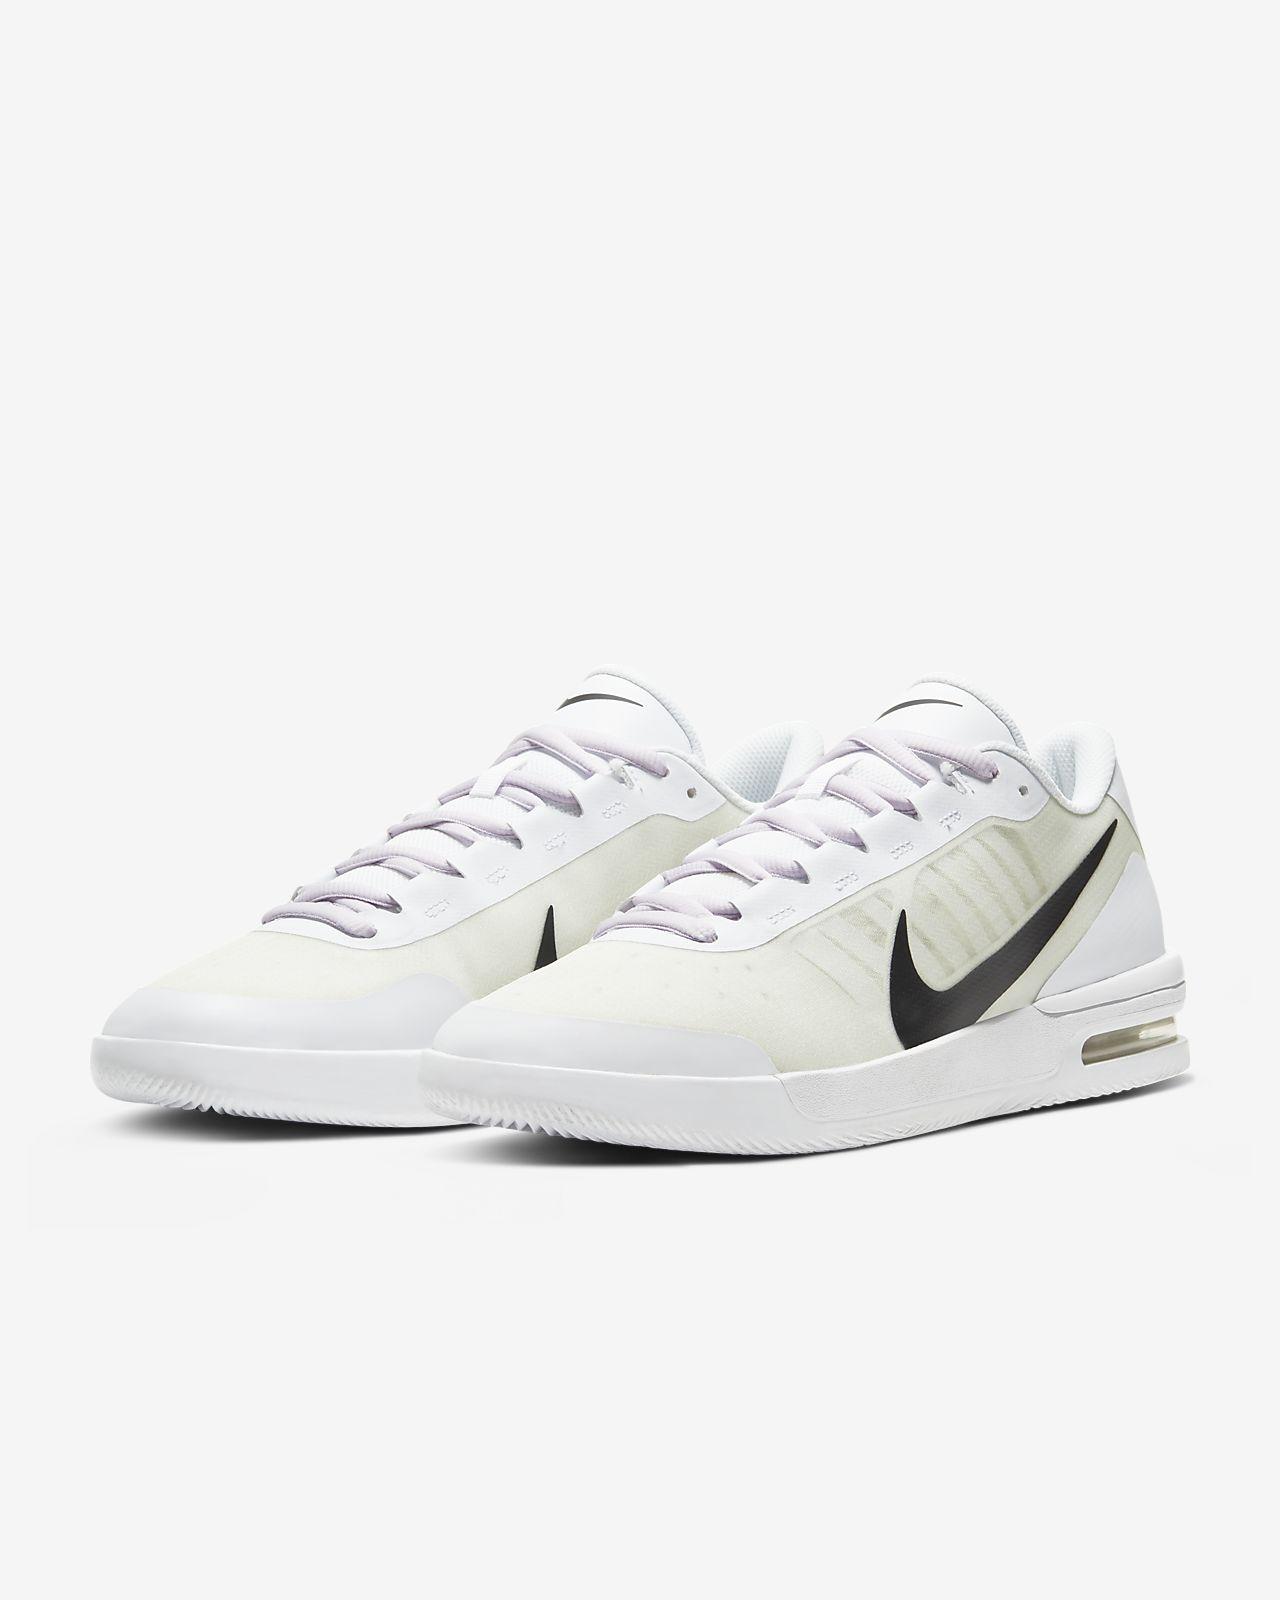 NikeCourt Air Max Vapor Wing MS Men's Multi Surface Tennis Shoe